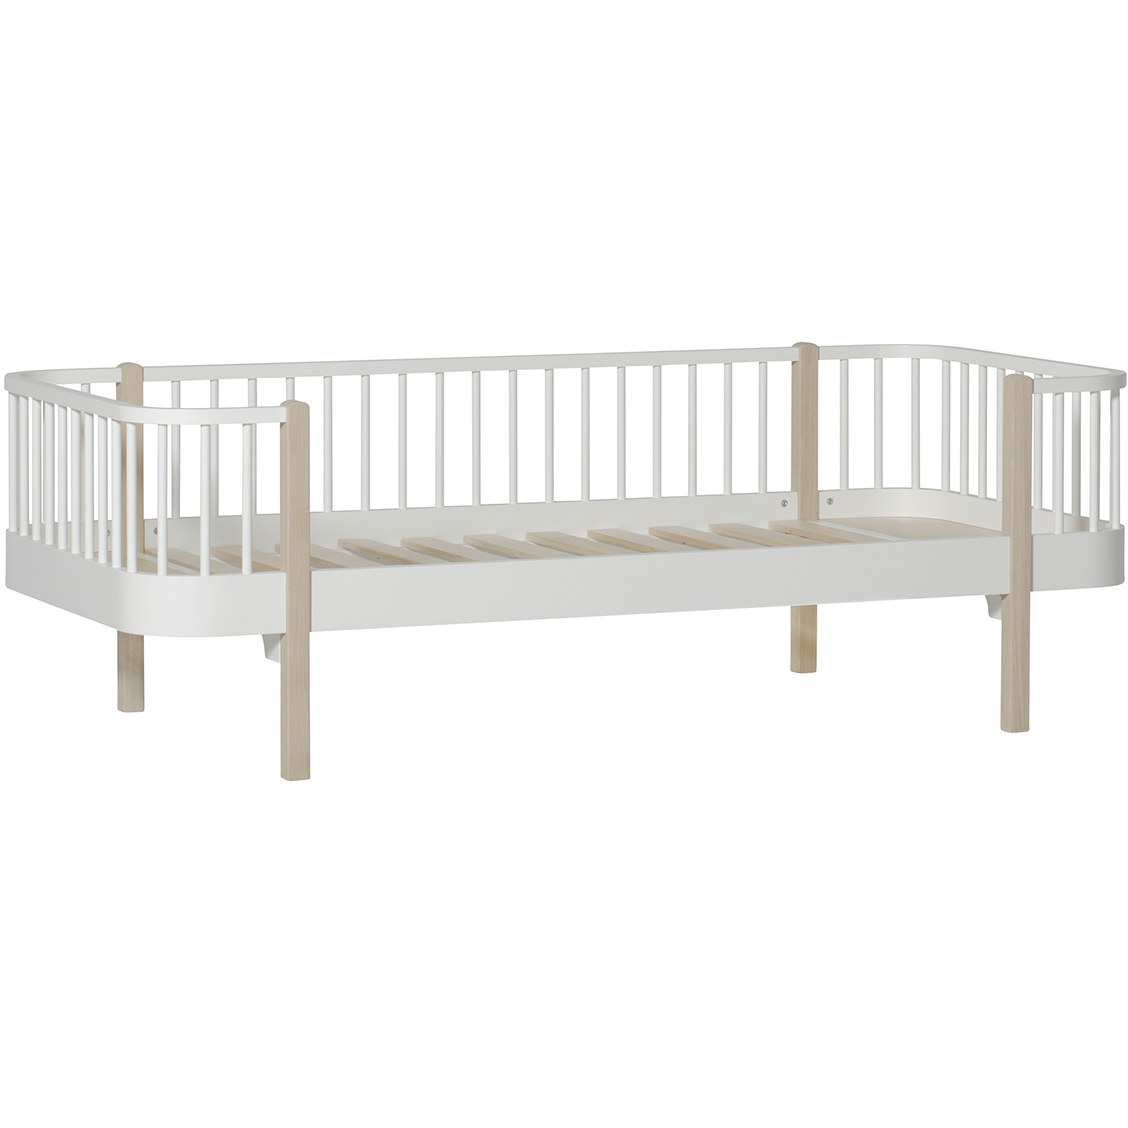 Wood Dagbädd, 90x200cm, Vit/Ek